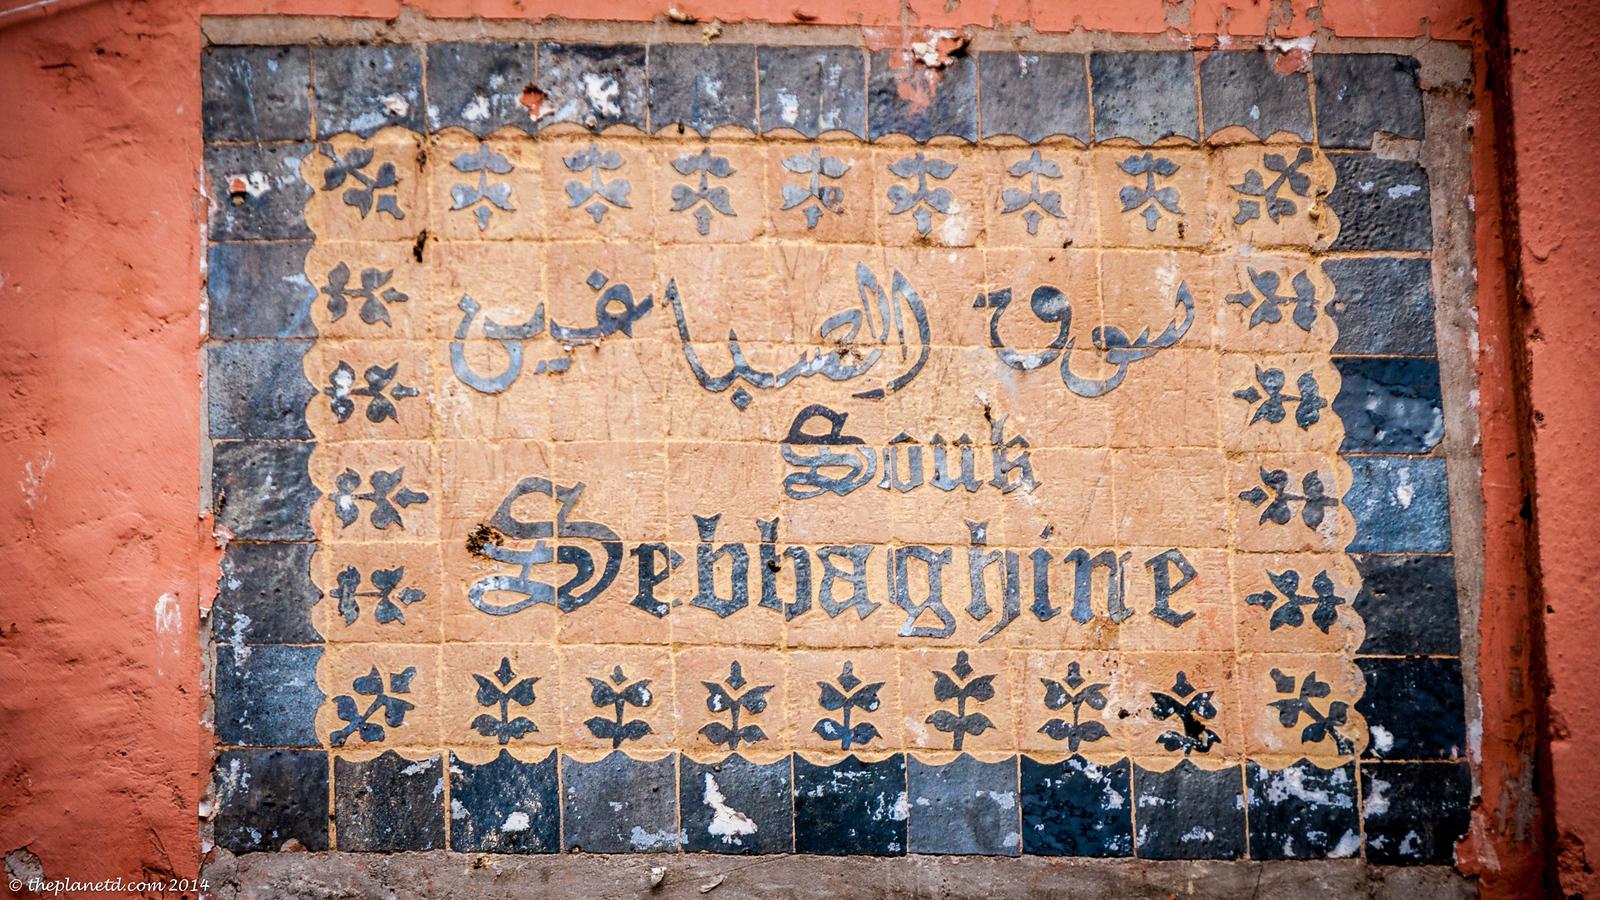 Shop in the Souks of Marrakech